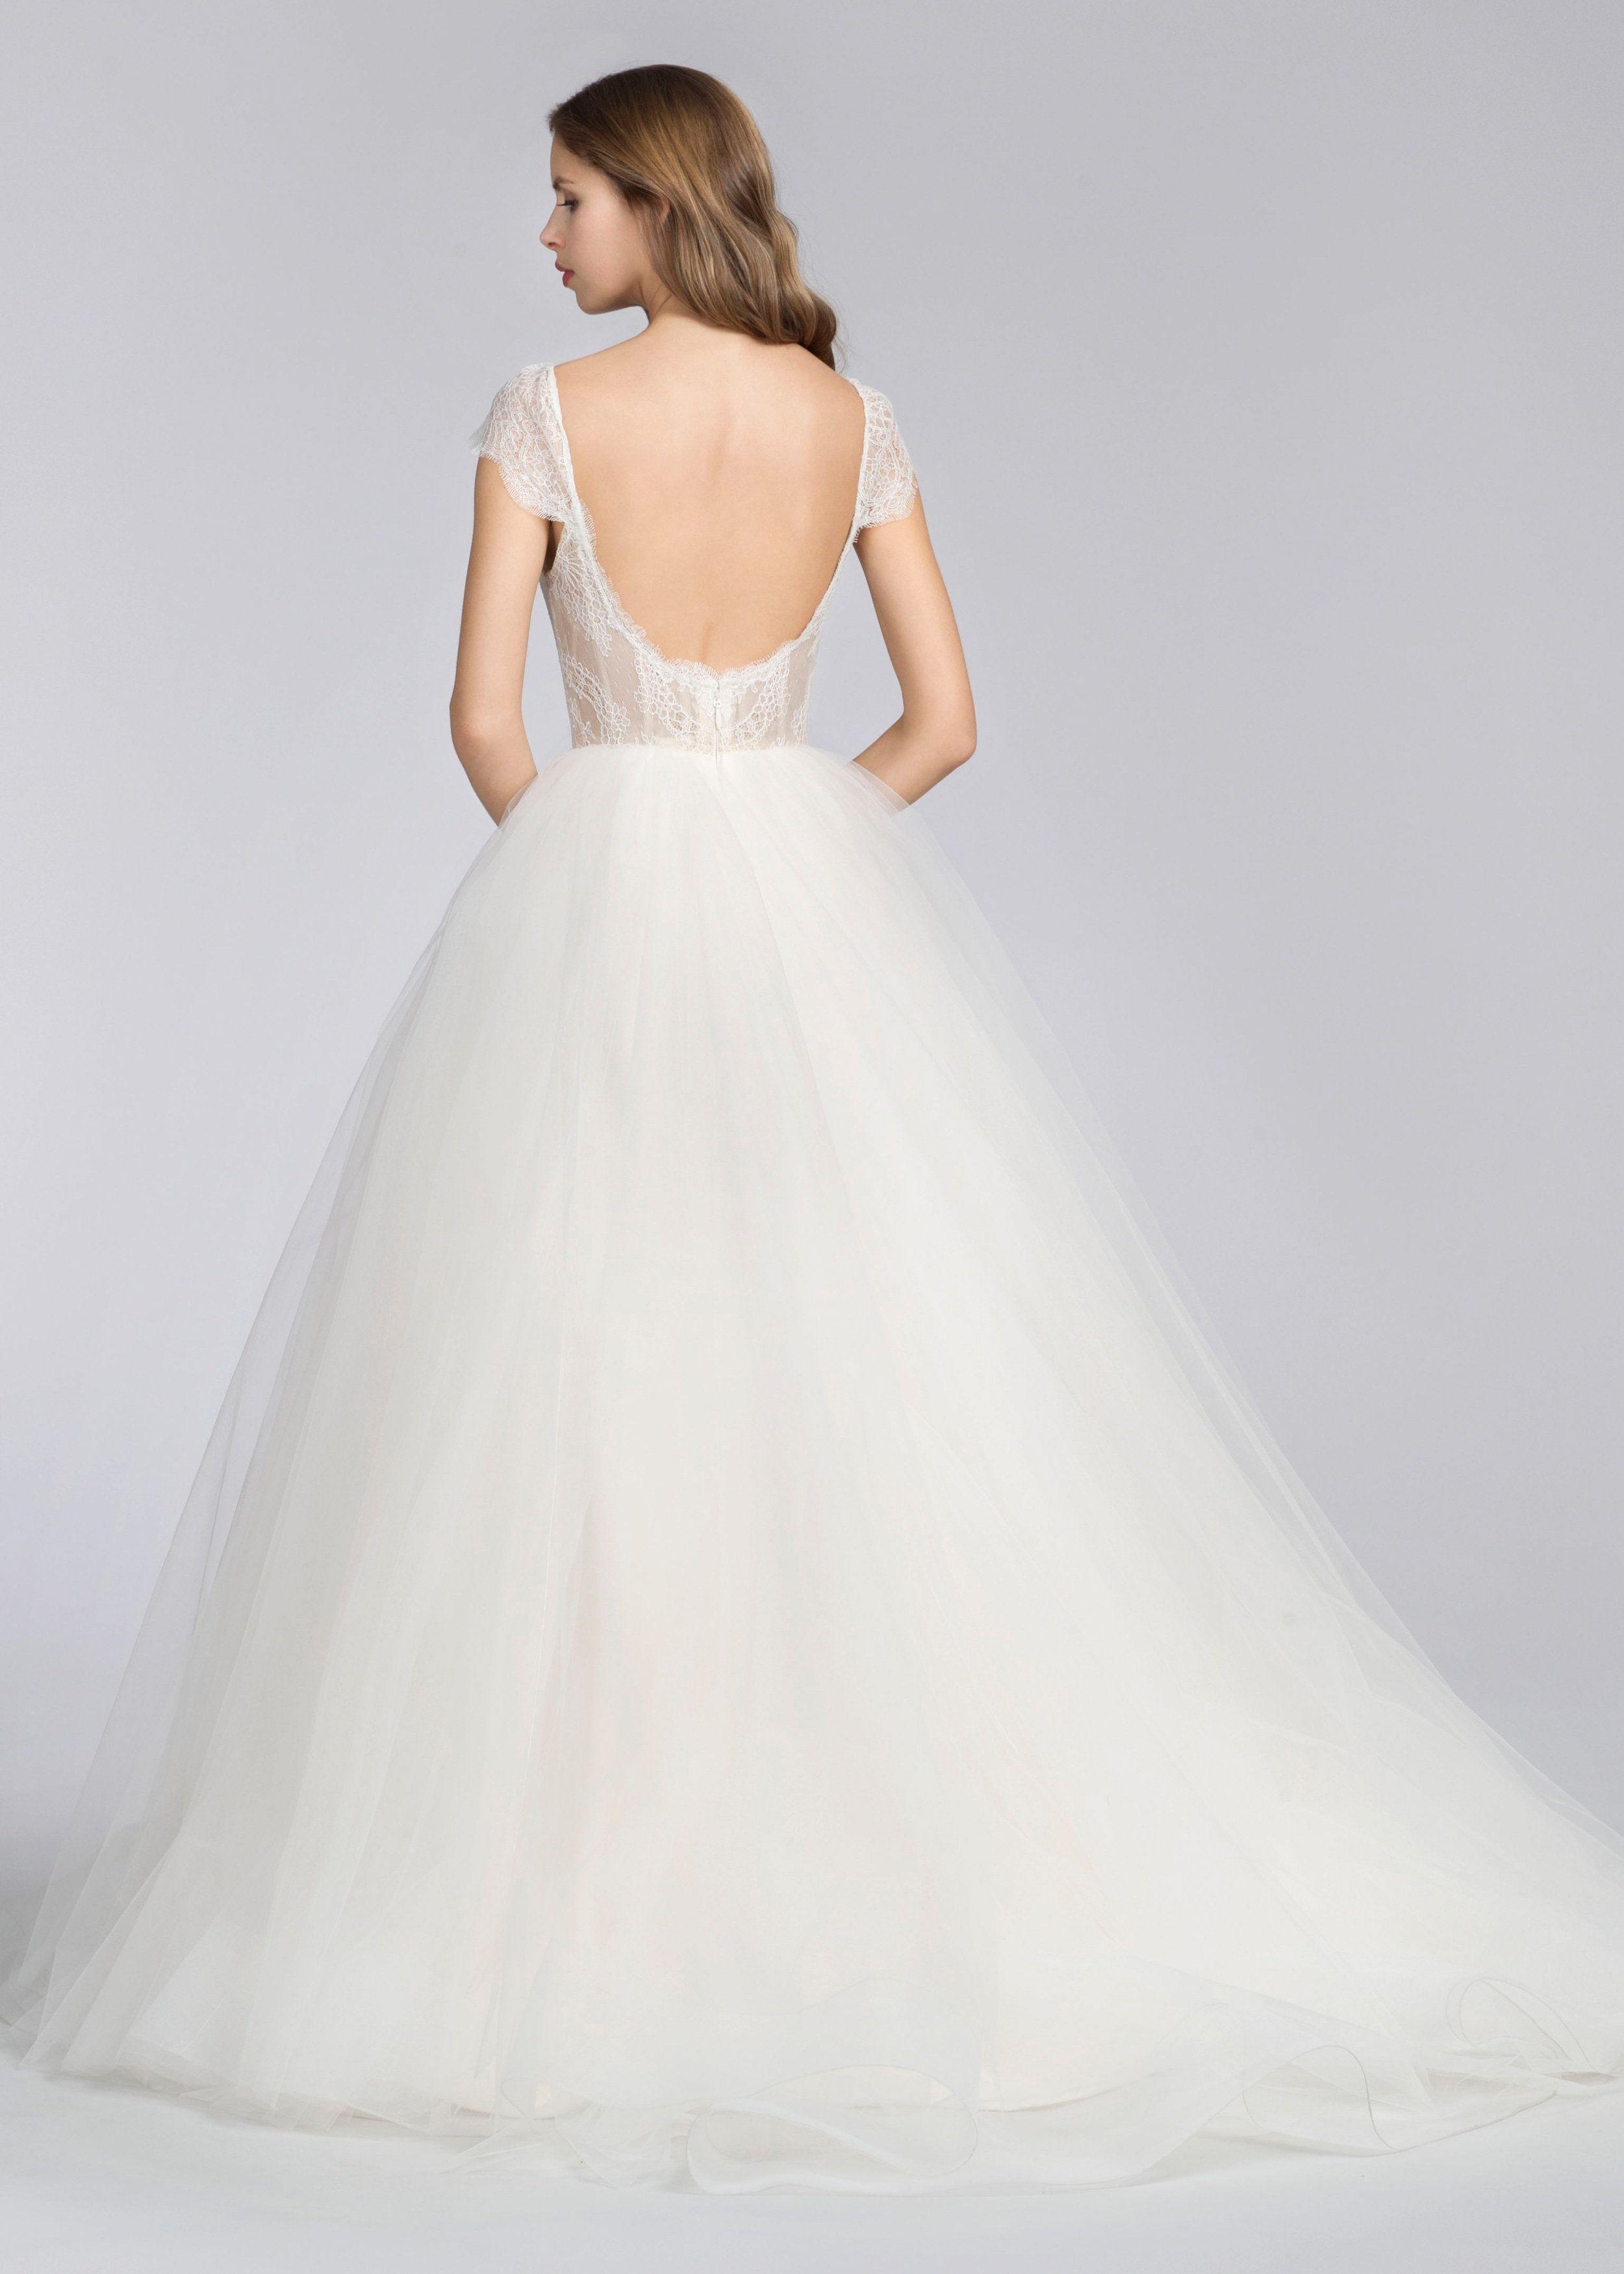 Style look book back wedding dresses pinterest chantilly